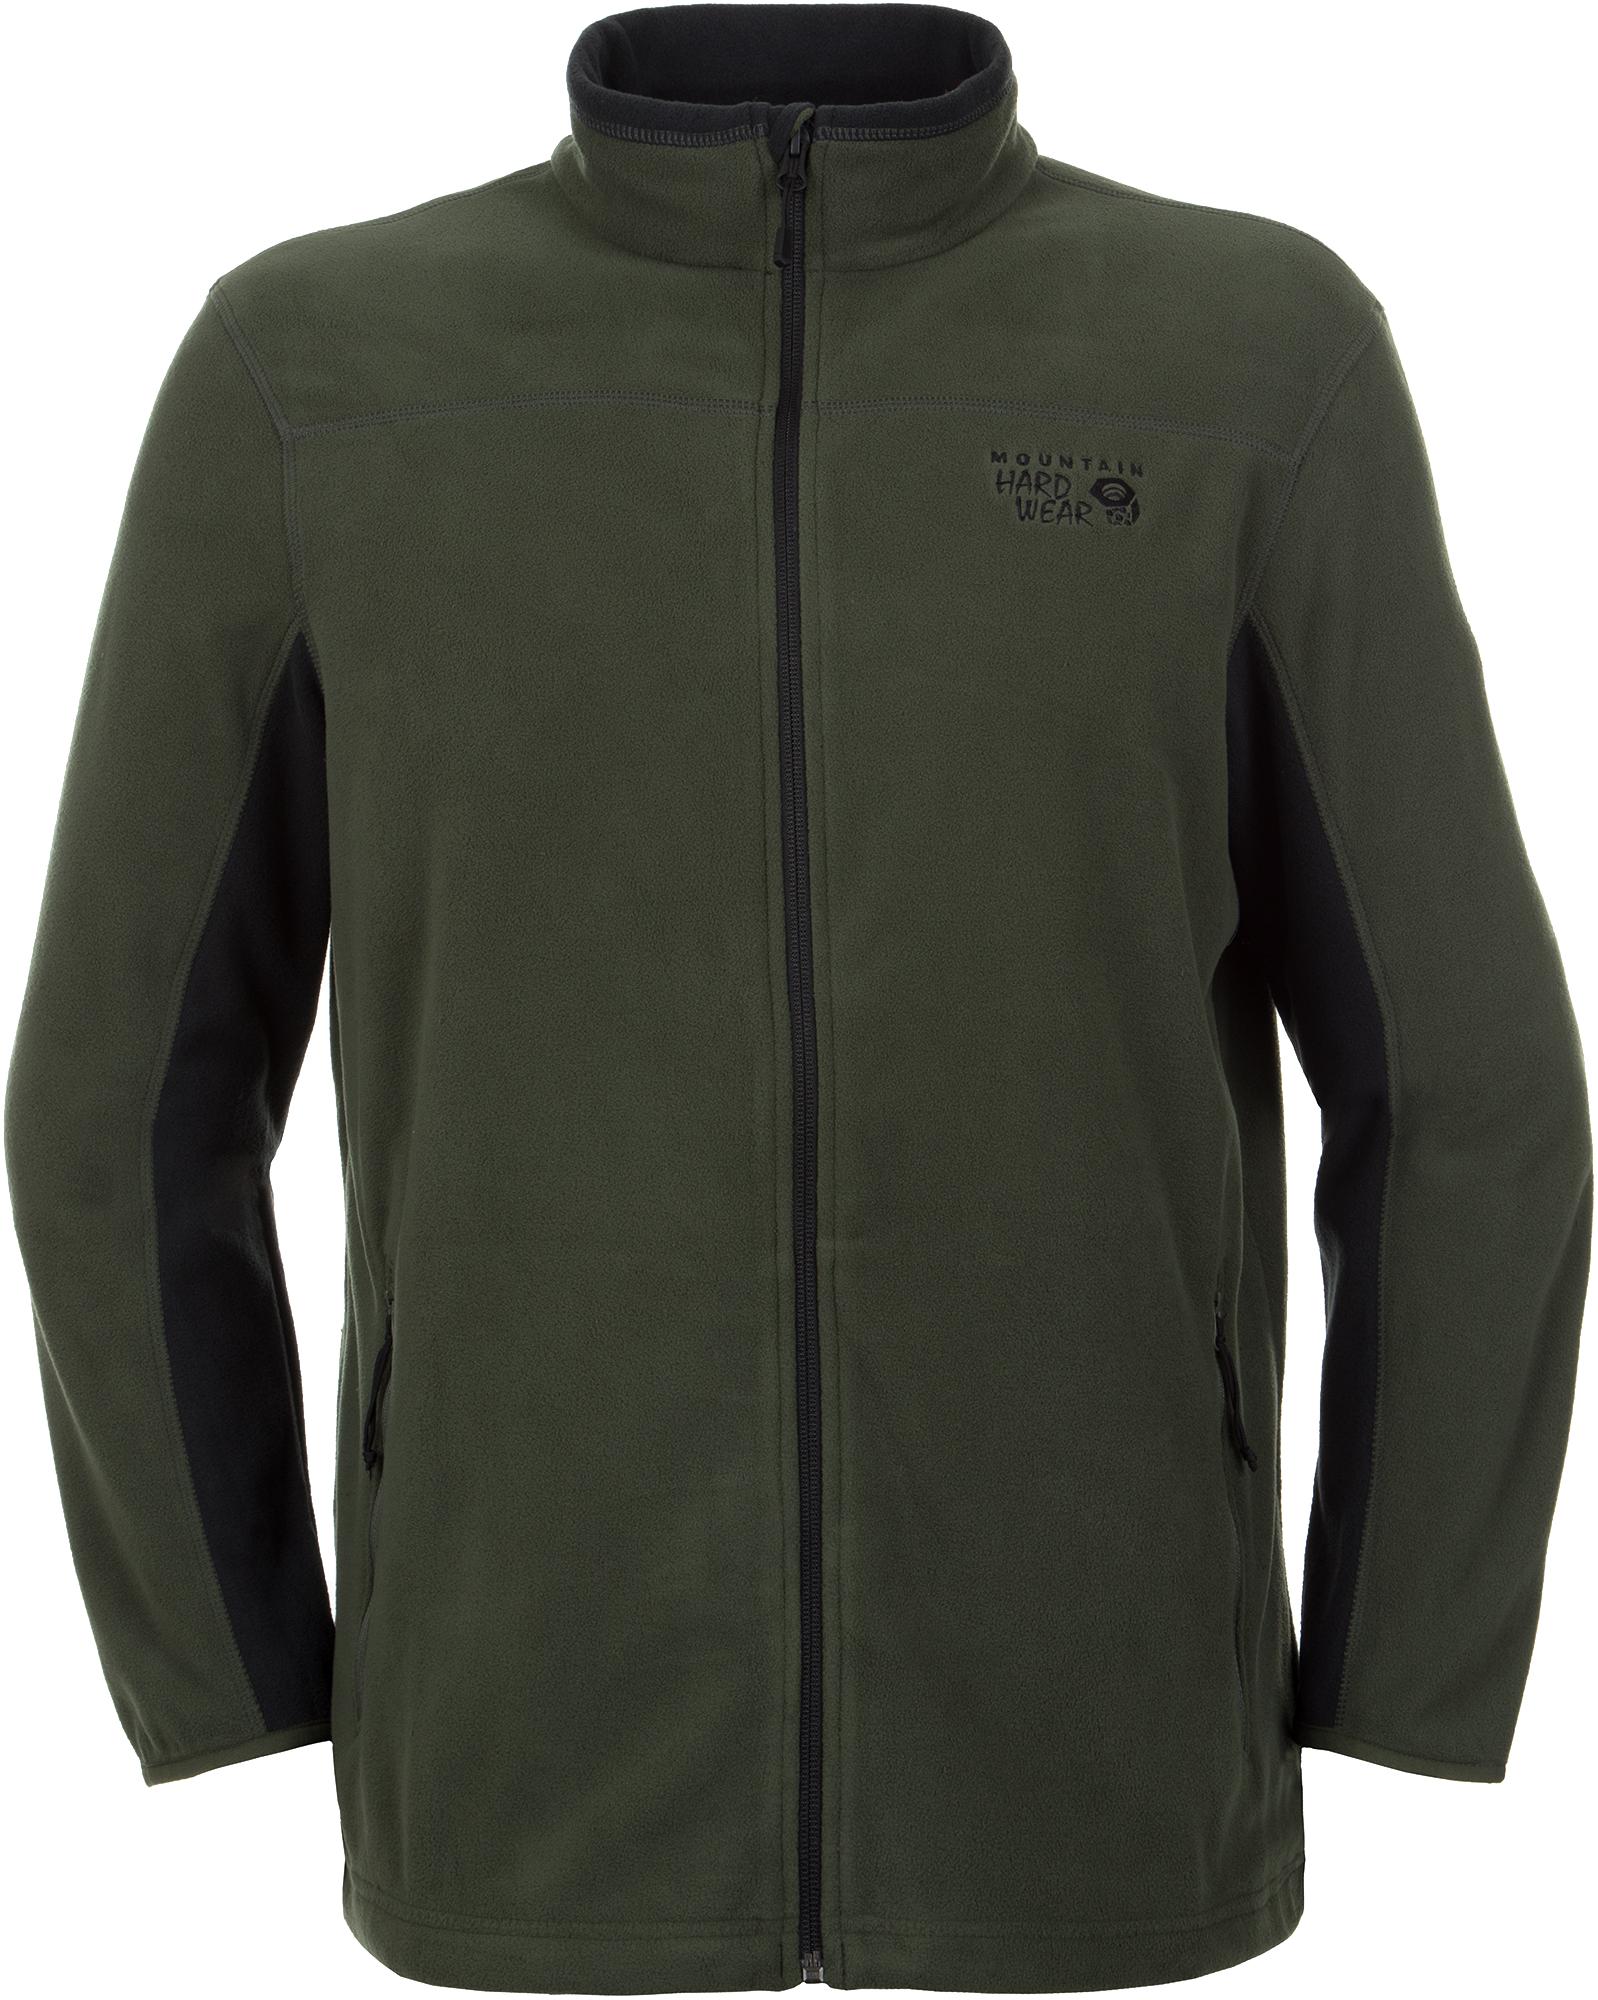 Mountain Hardwear Джемпер мужской Mountain Hardwear Microchill, размер 52 цены онлайн